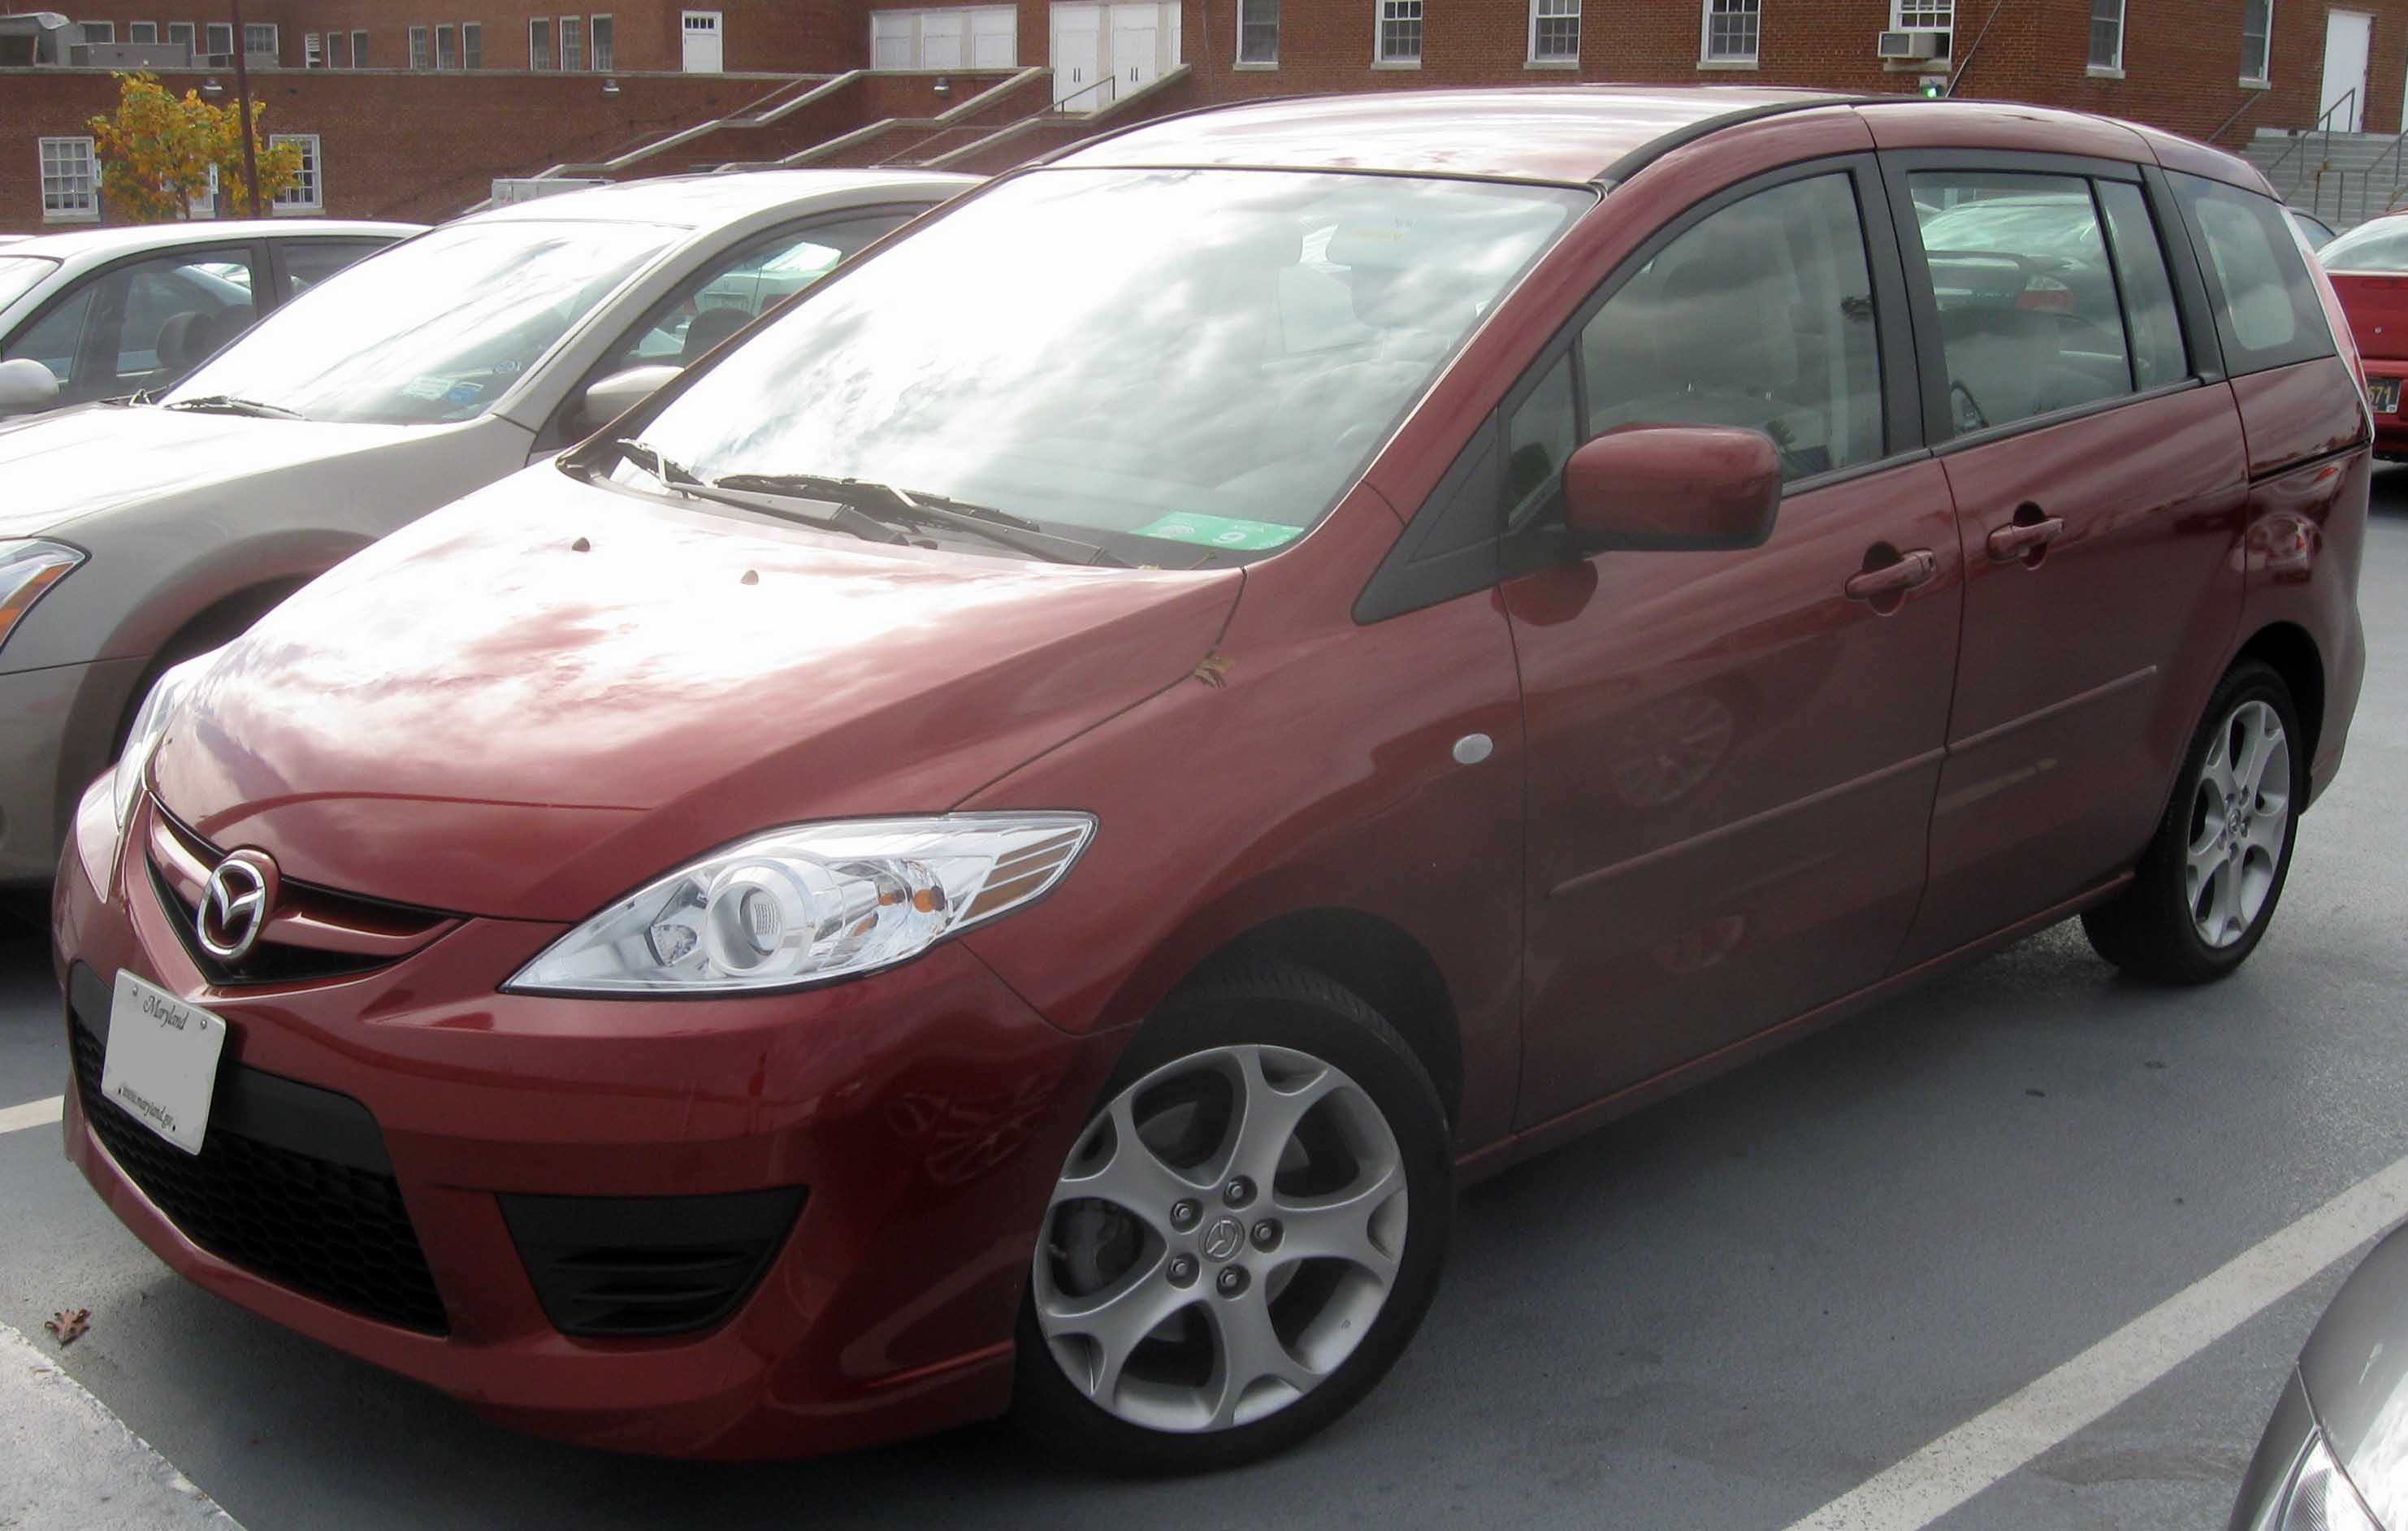 https://upload.wikimedia.org/wikipedia/commons/1/13/2008_Mazda_5.jpg